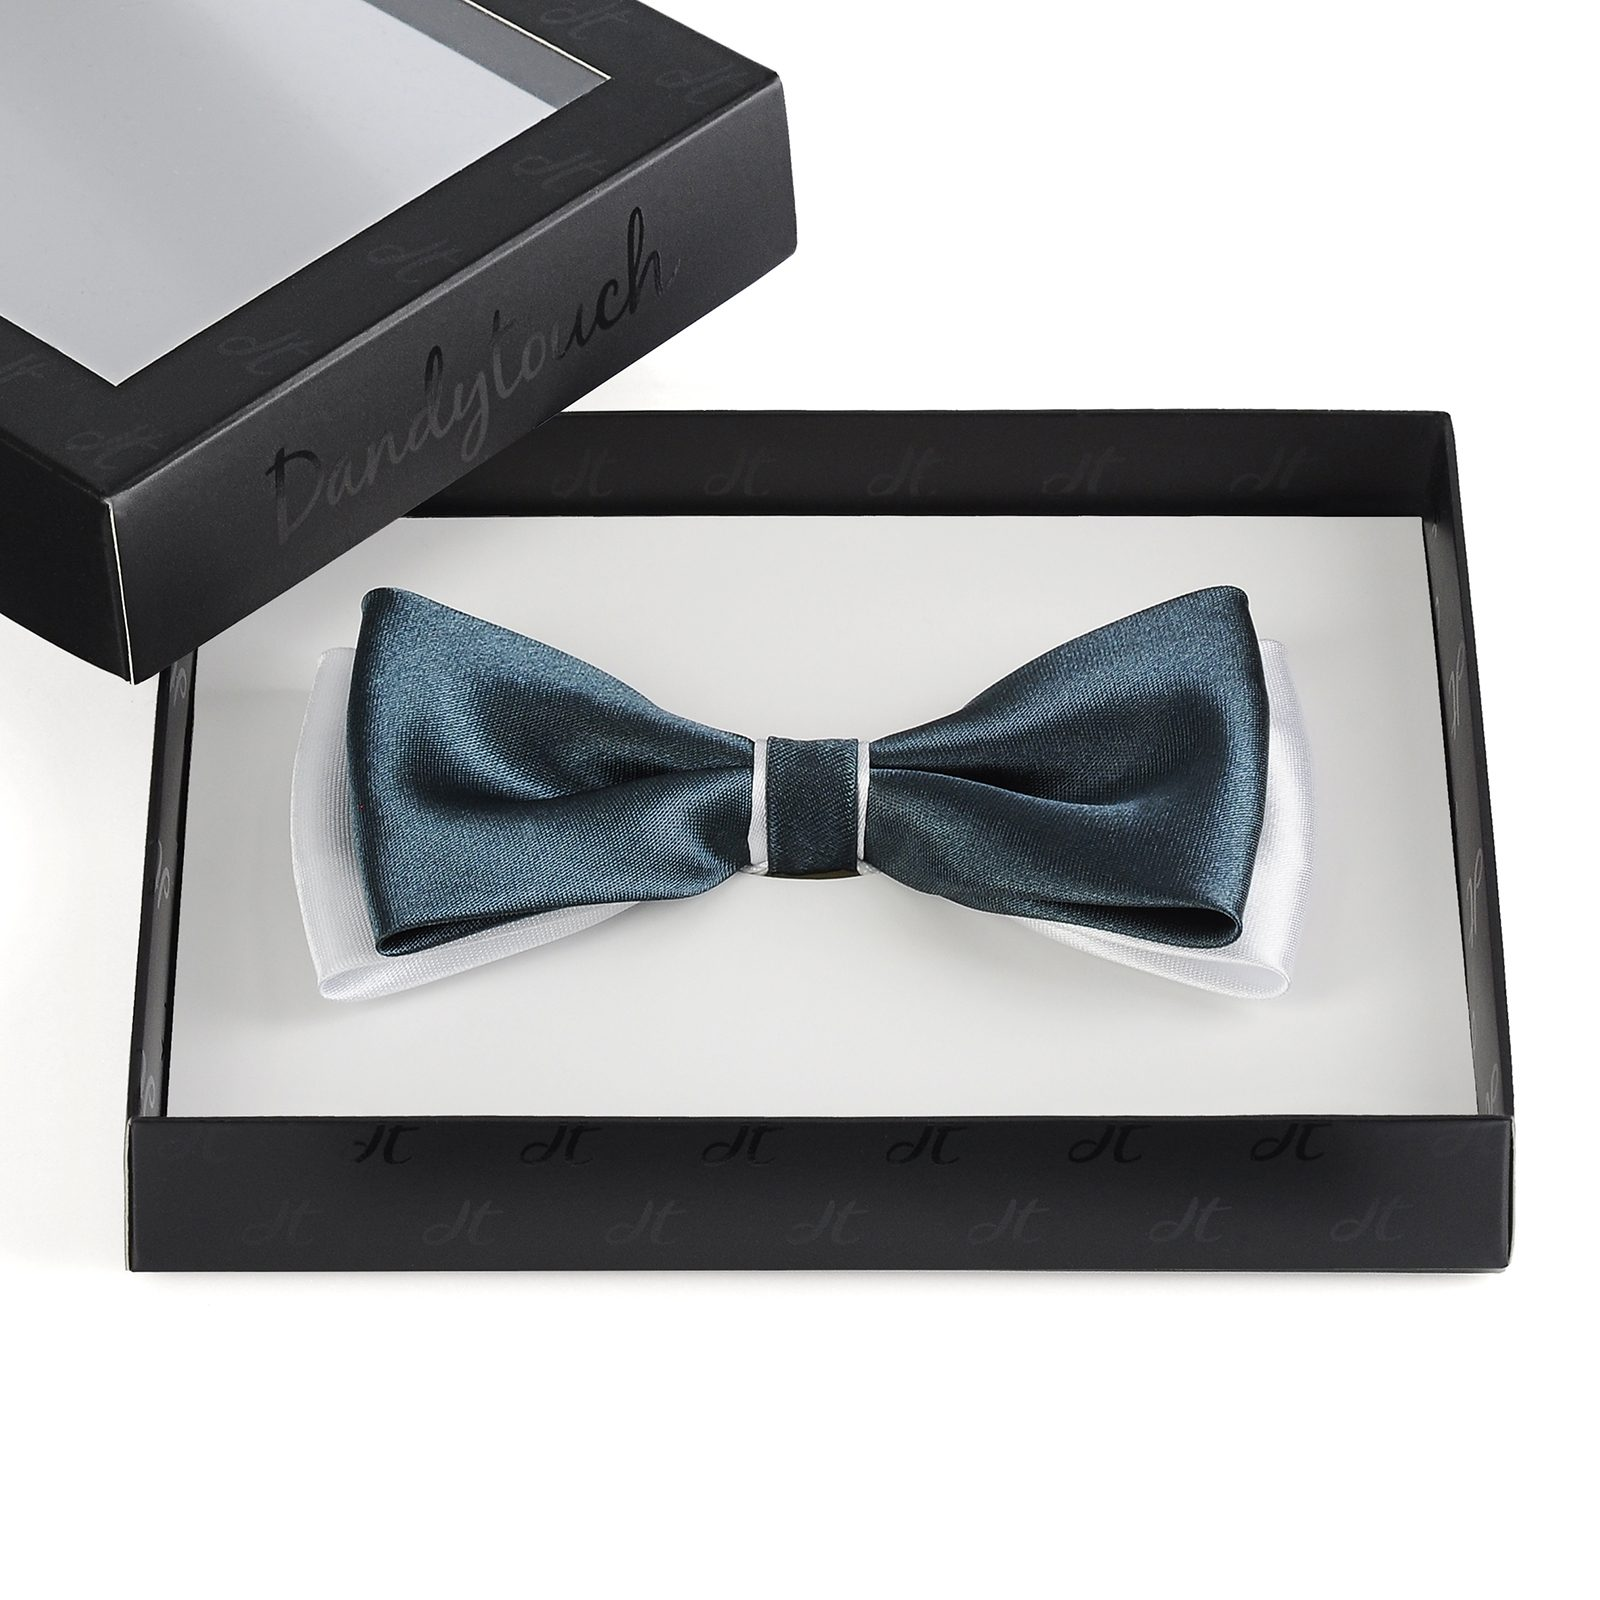 http://lookbook.allee-du-foulard.fr/wp-content/uploads/2018/11/ND-00104-F16-noeud-papillon-bicolore-gris-anthracite-blanc-boite-dandytouch-1600x1600.jpg